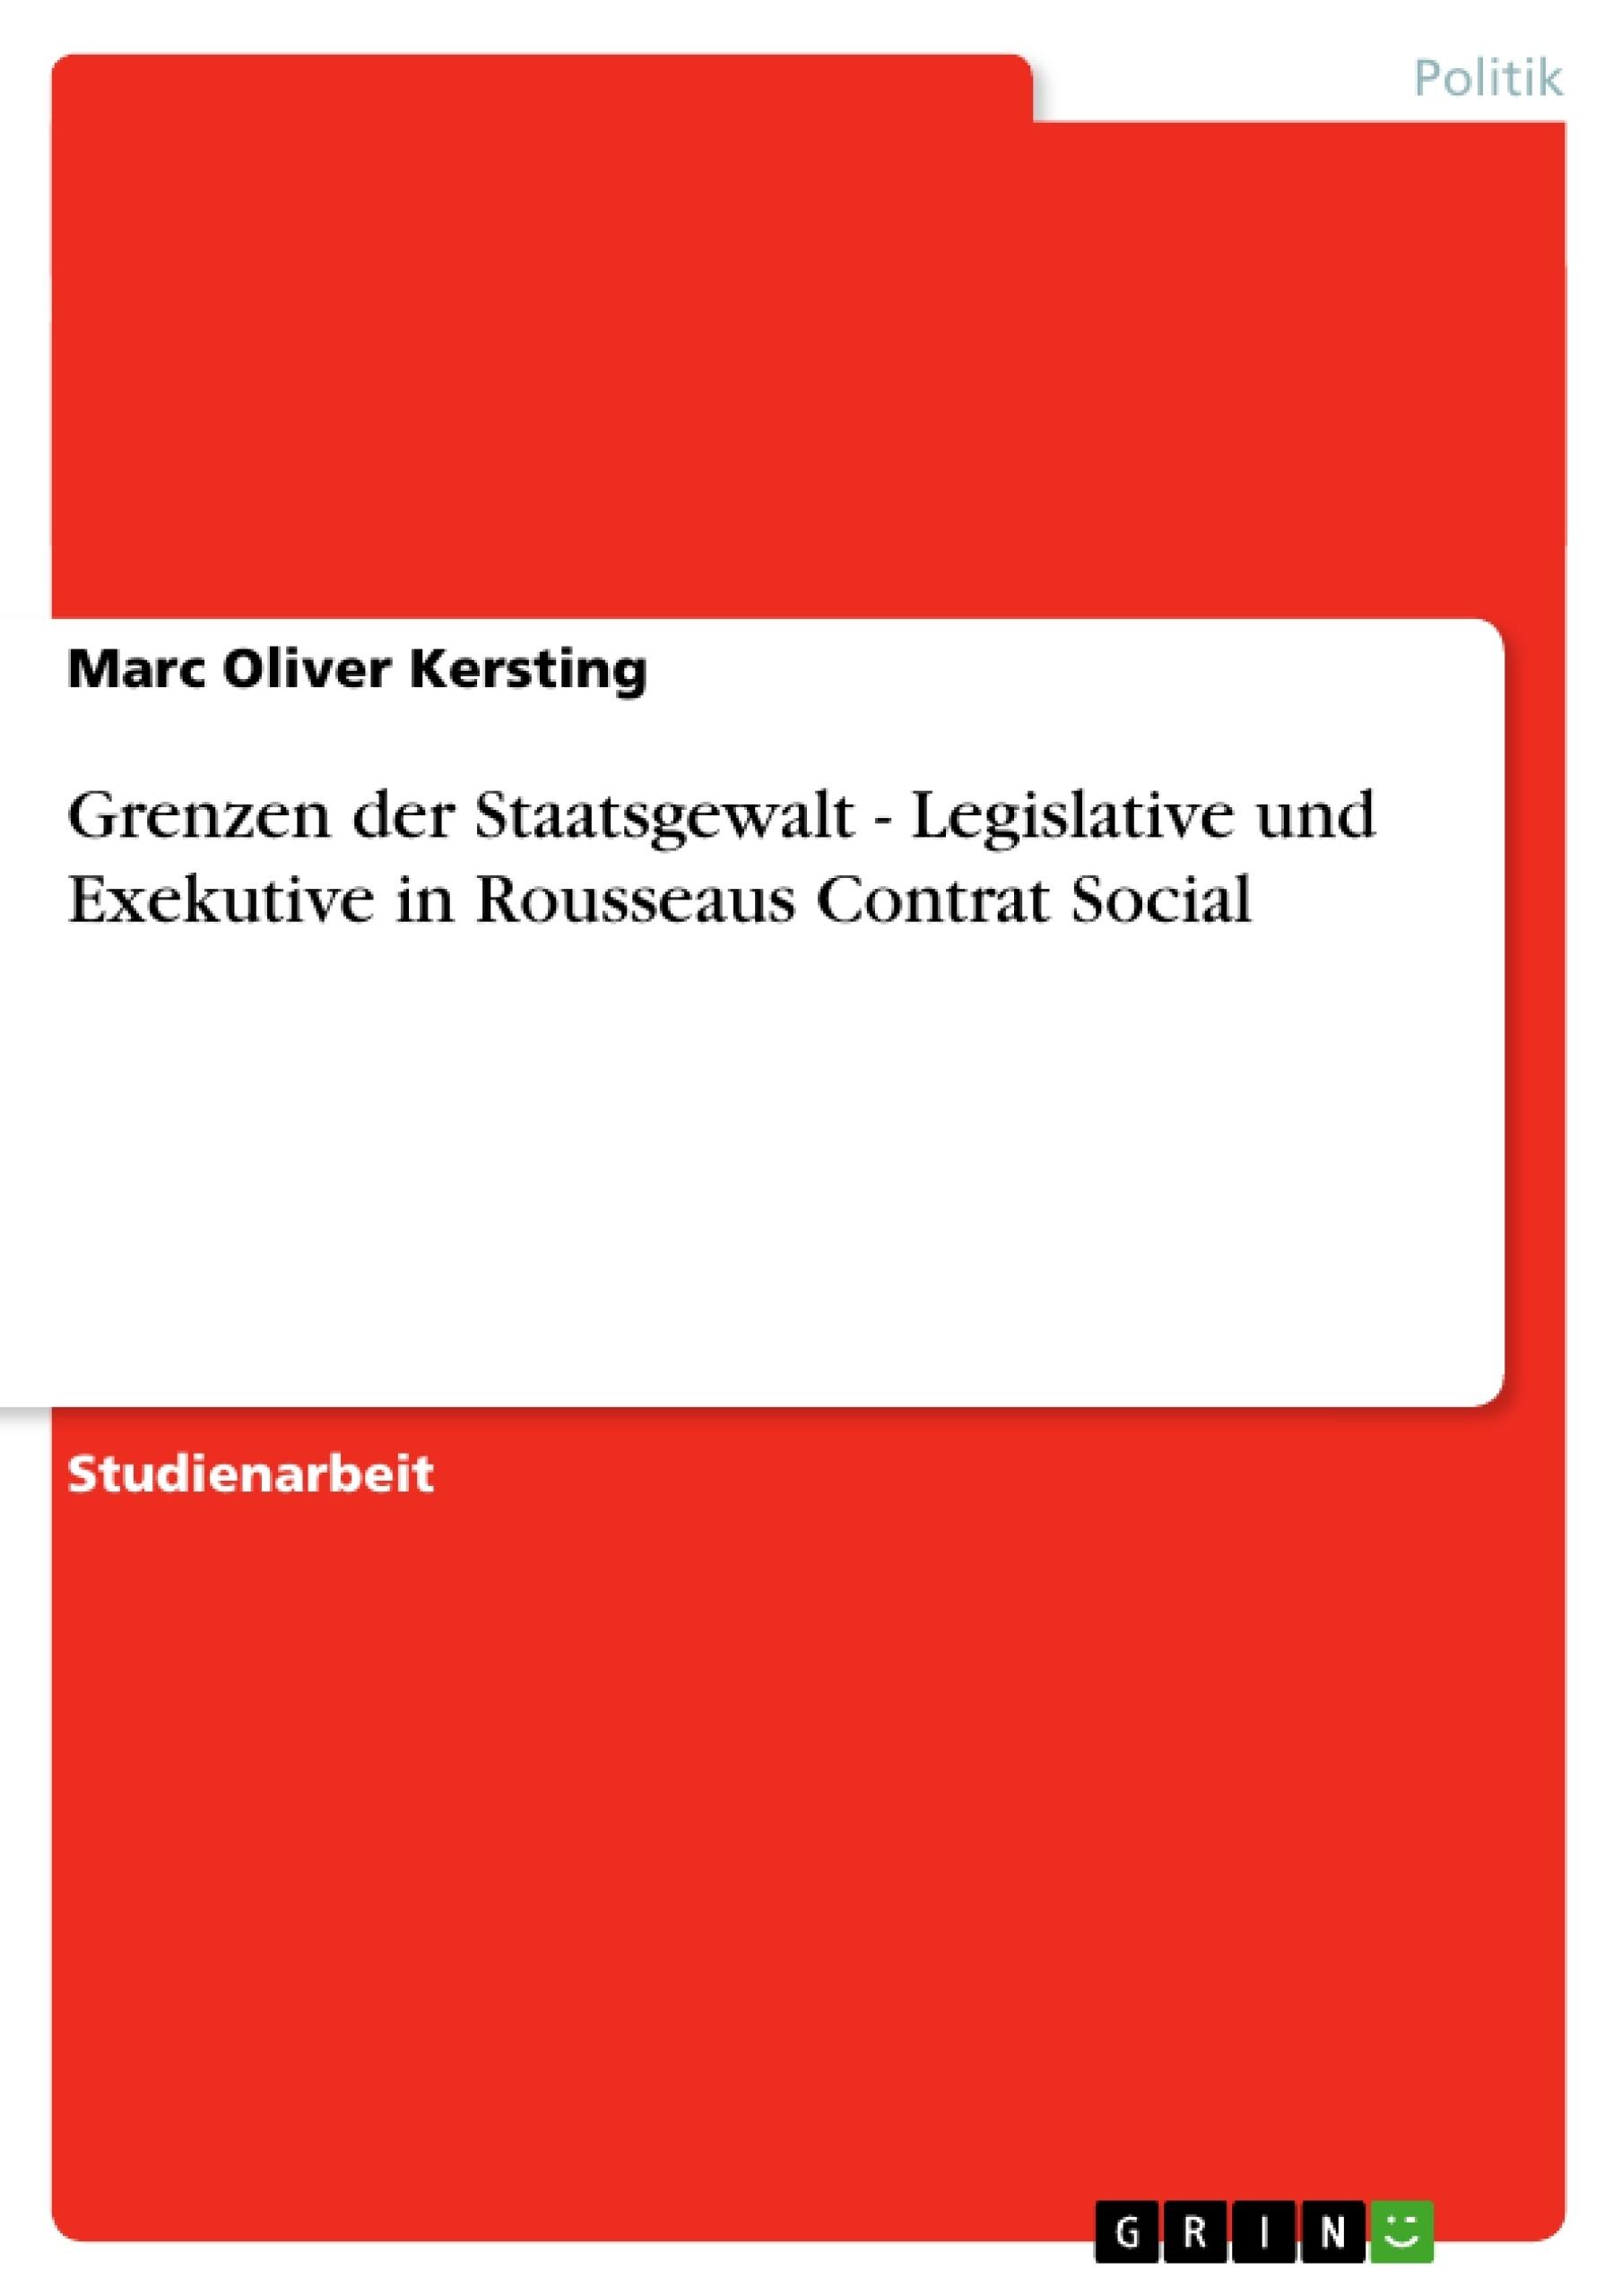 Titel: Grenzen der Staatsgewalt - Legislative und Exekutive in Rousseaus Contrat Social